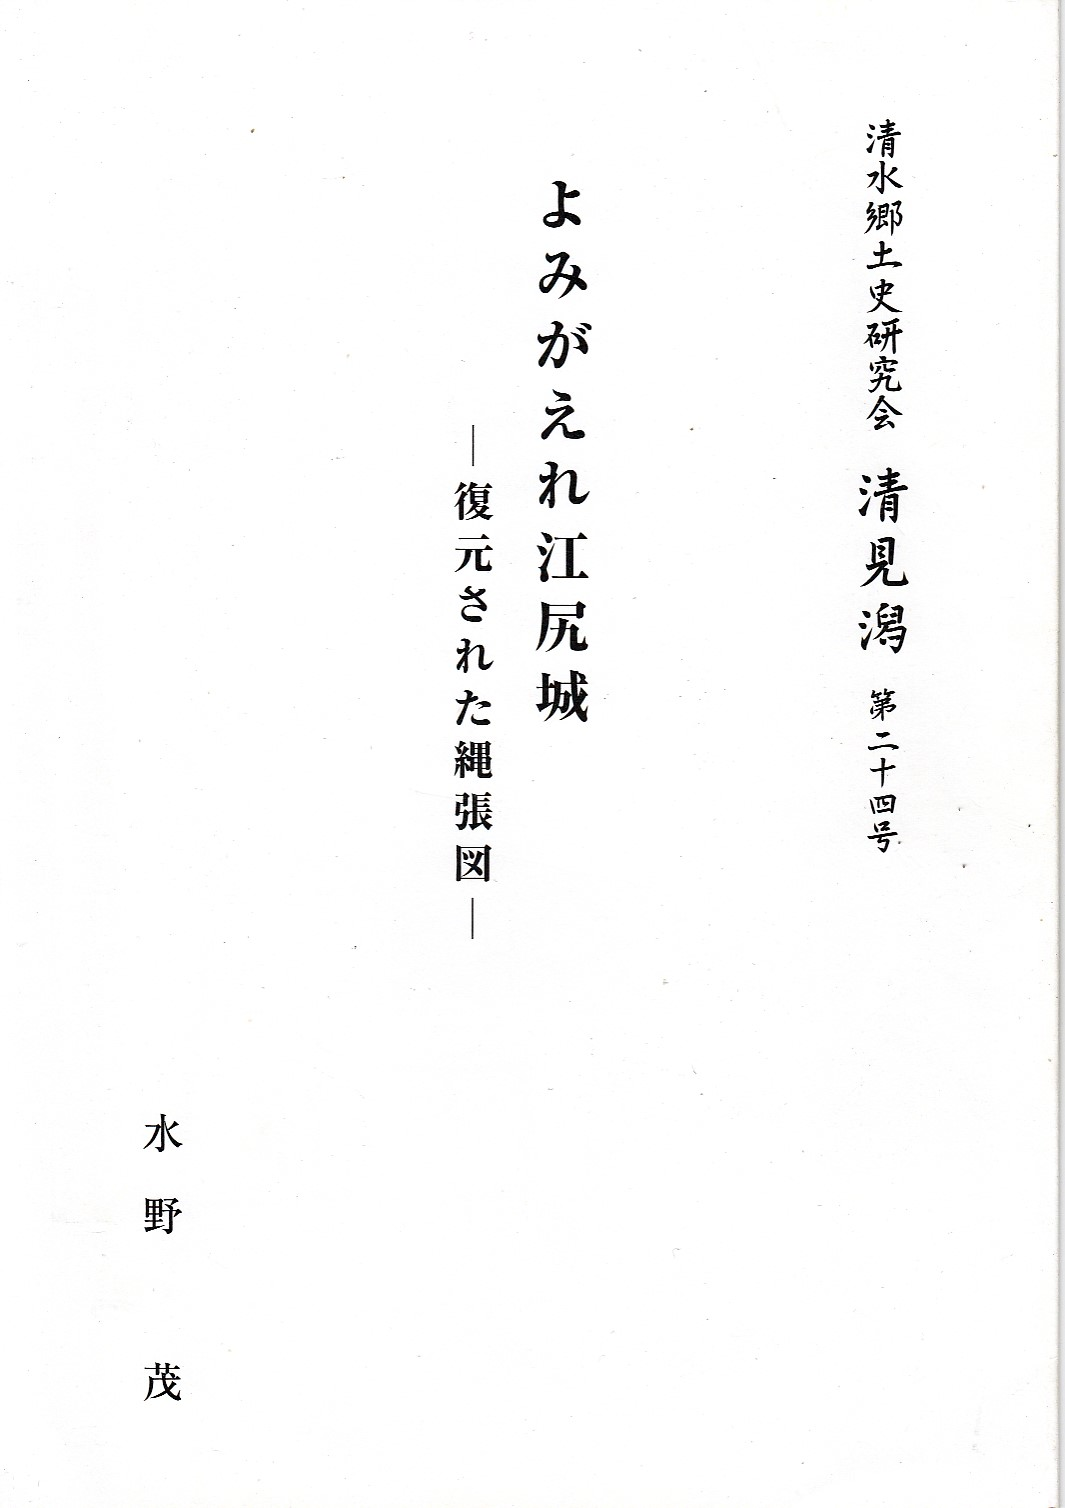 No-0229